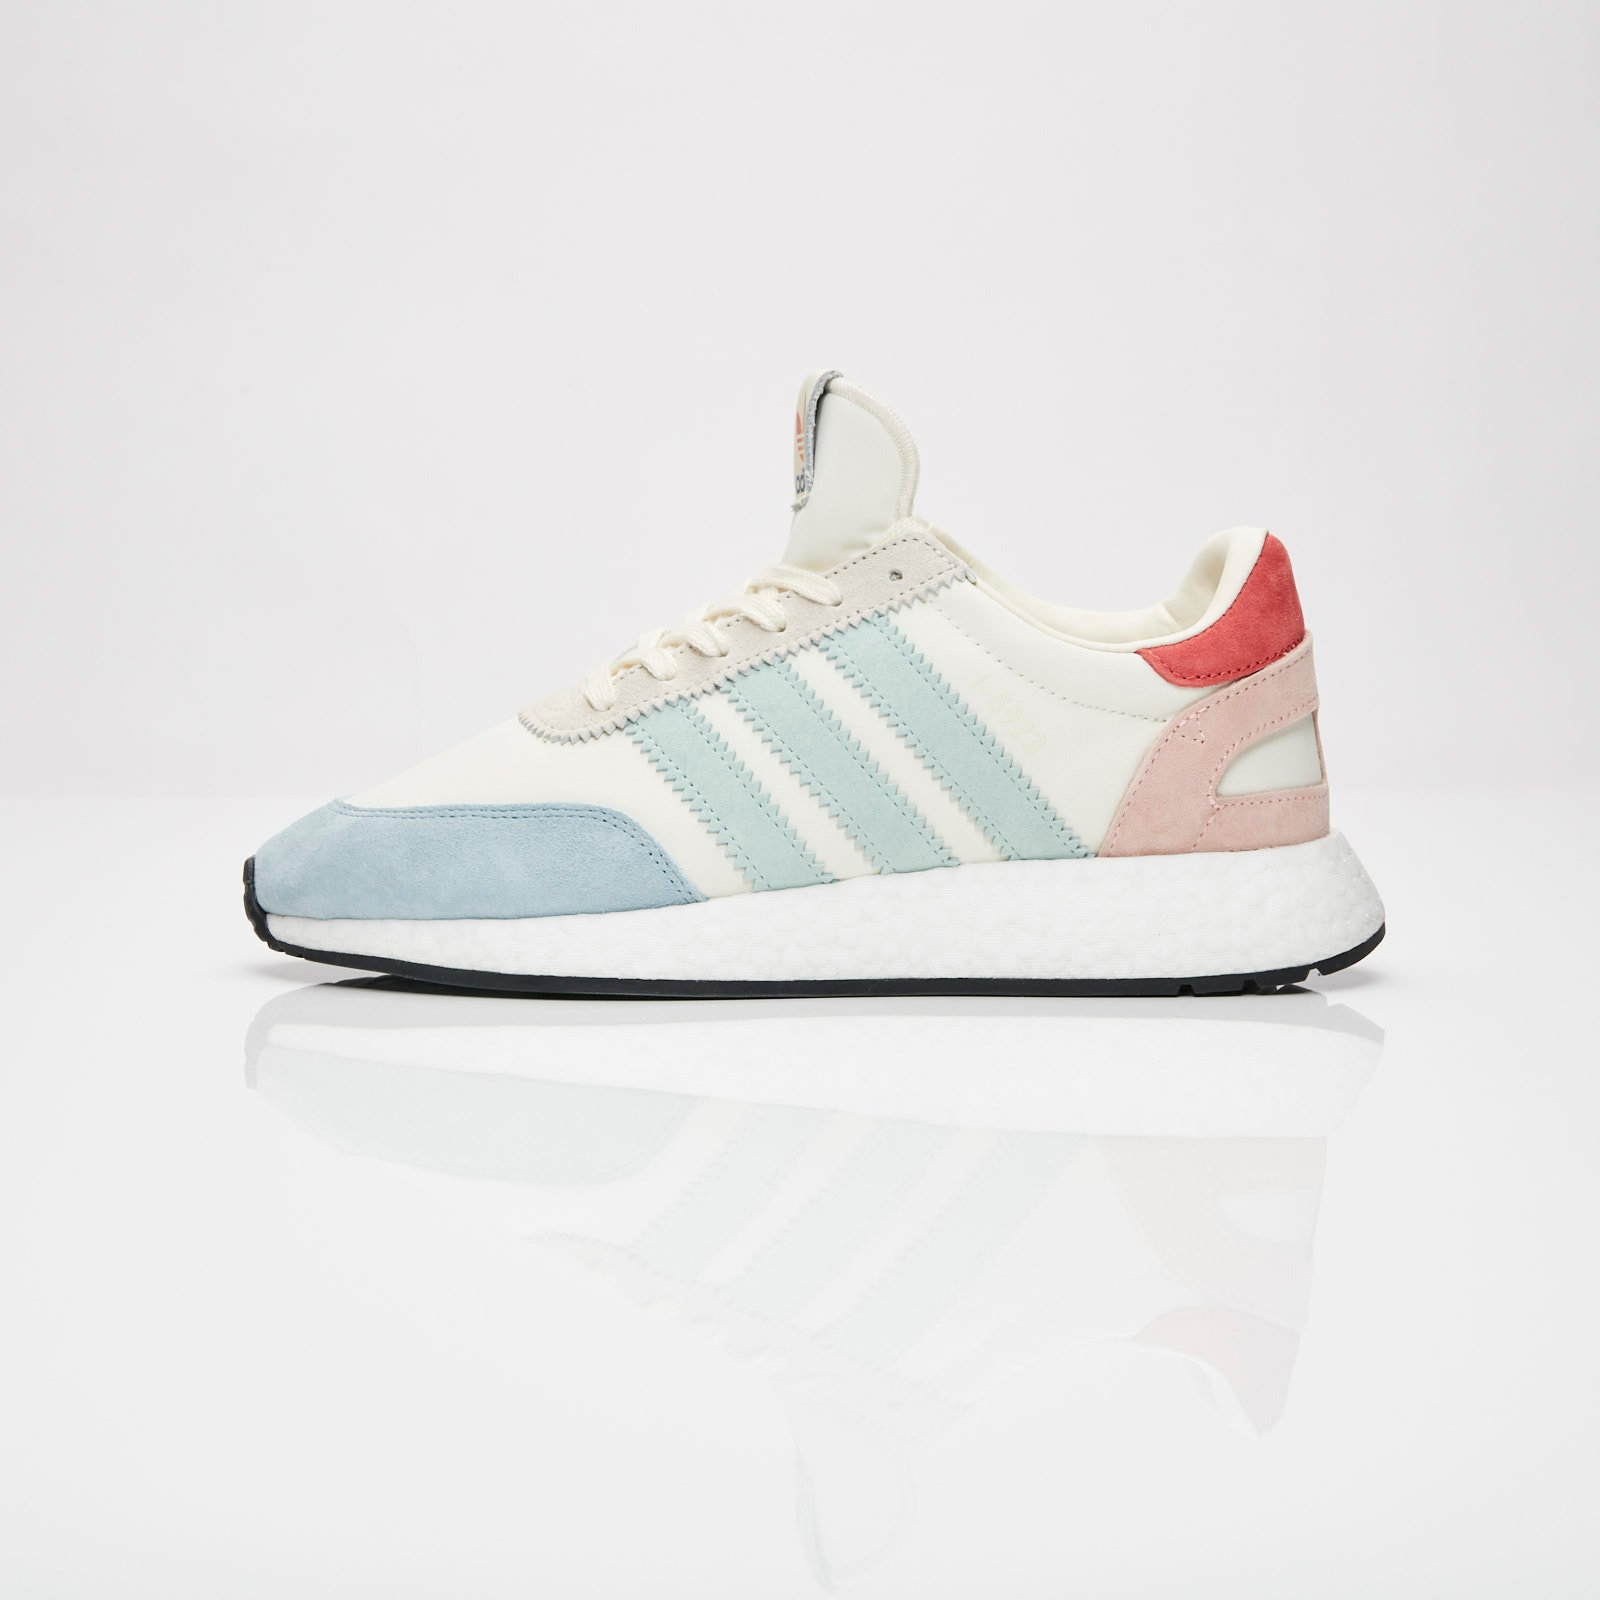 eeffe663d420d8 adidas I-5923 - B41984 - Sneakersnstuff